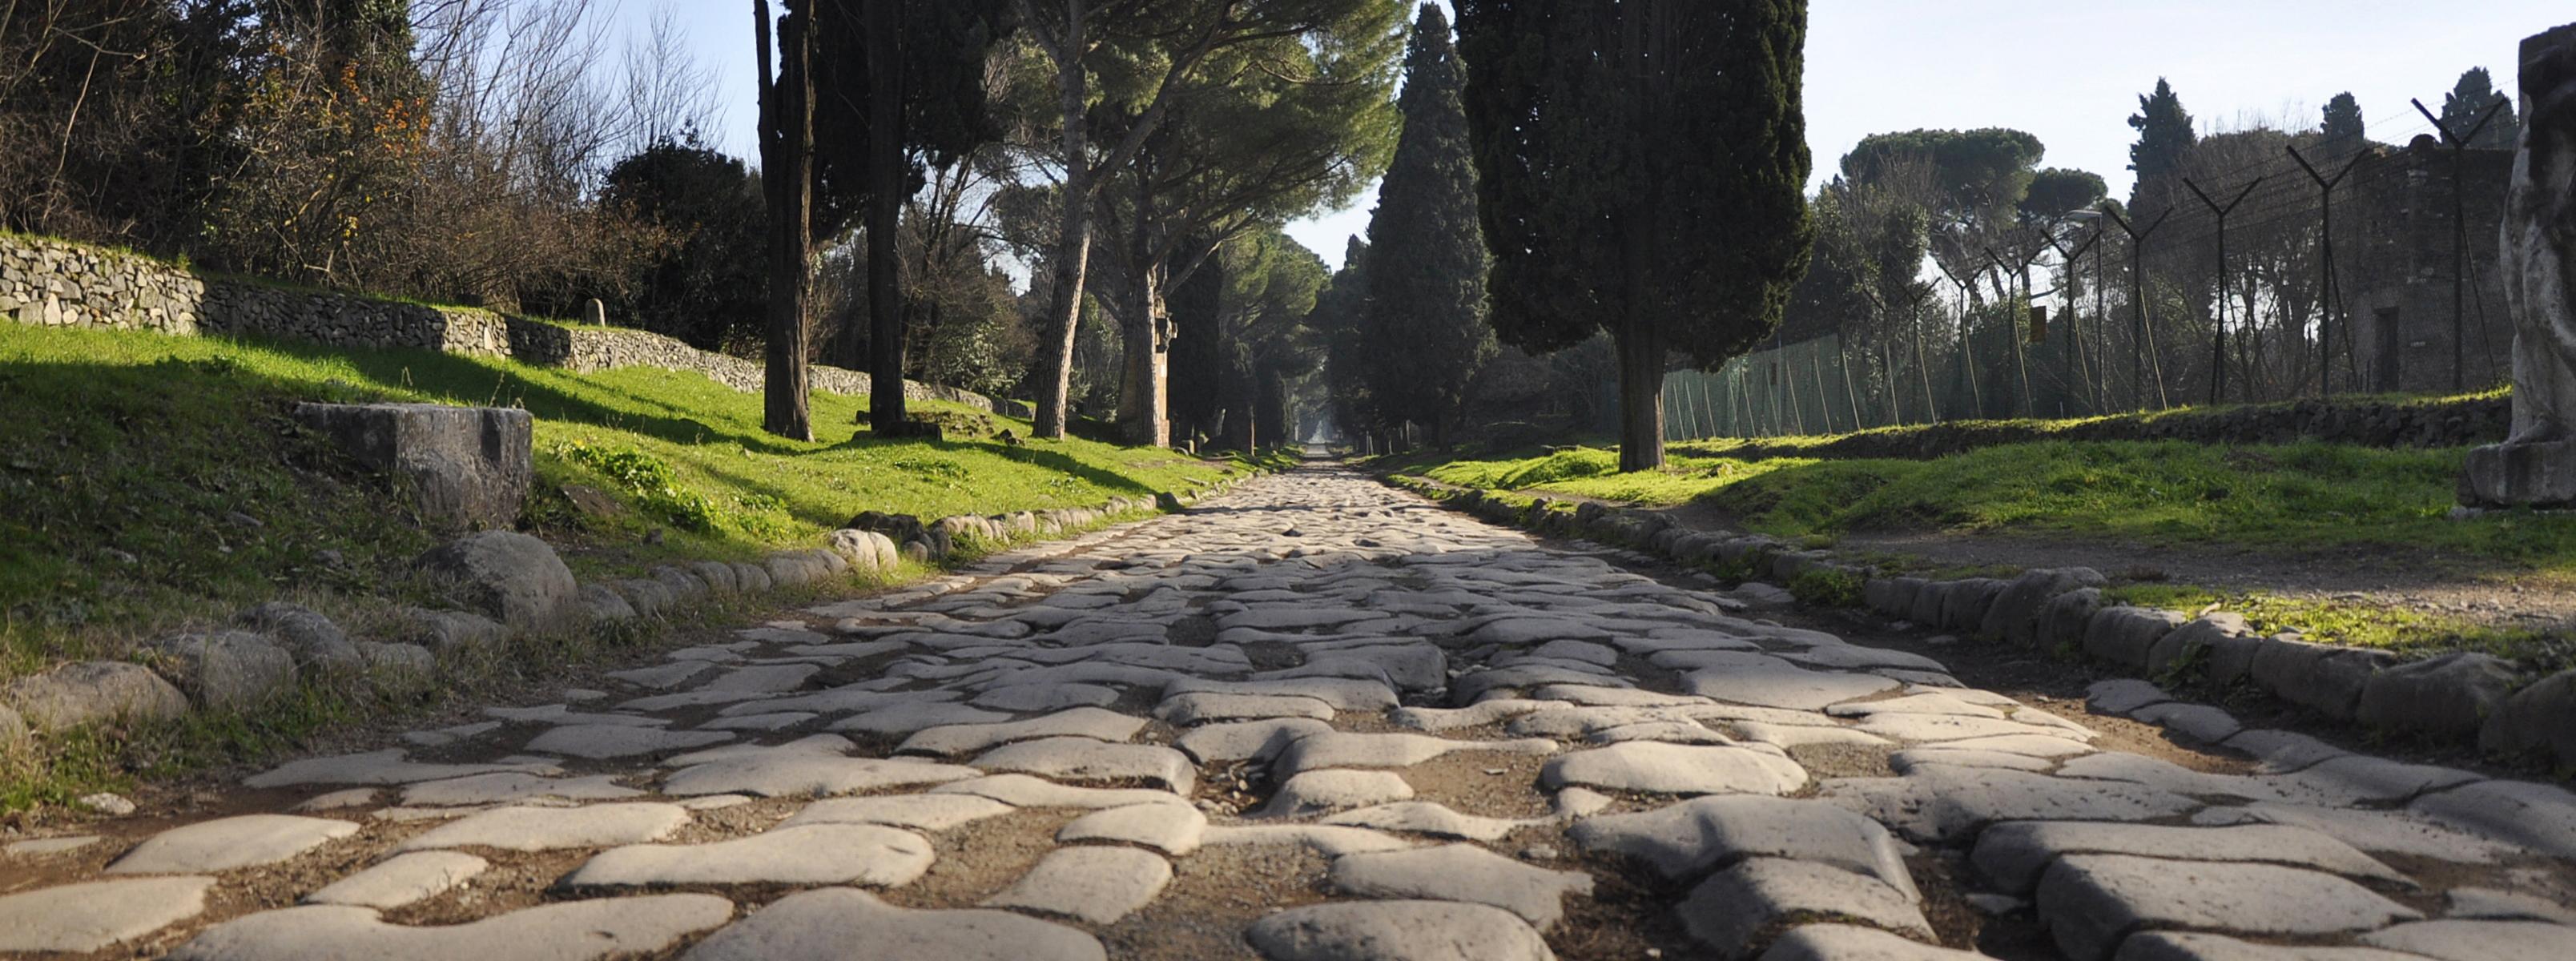 Via Appia | Ontdek de oudste weg naar Rome met Elsevier Weekblad